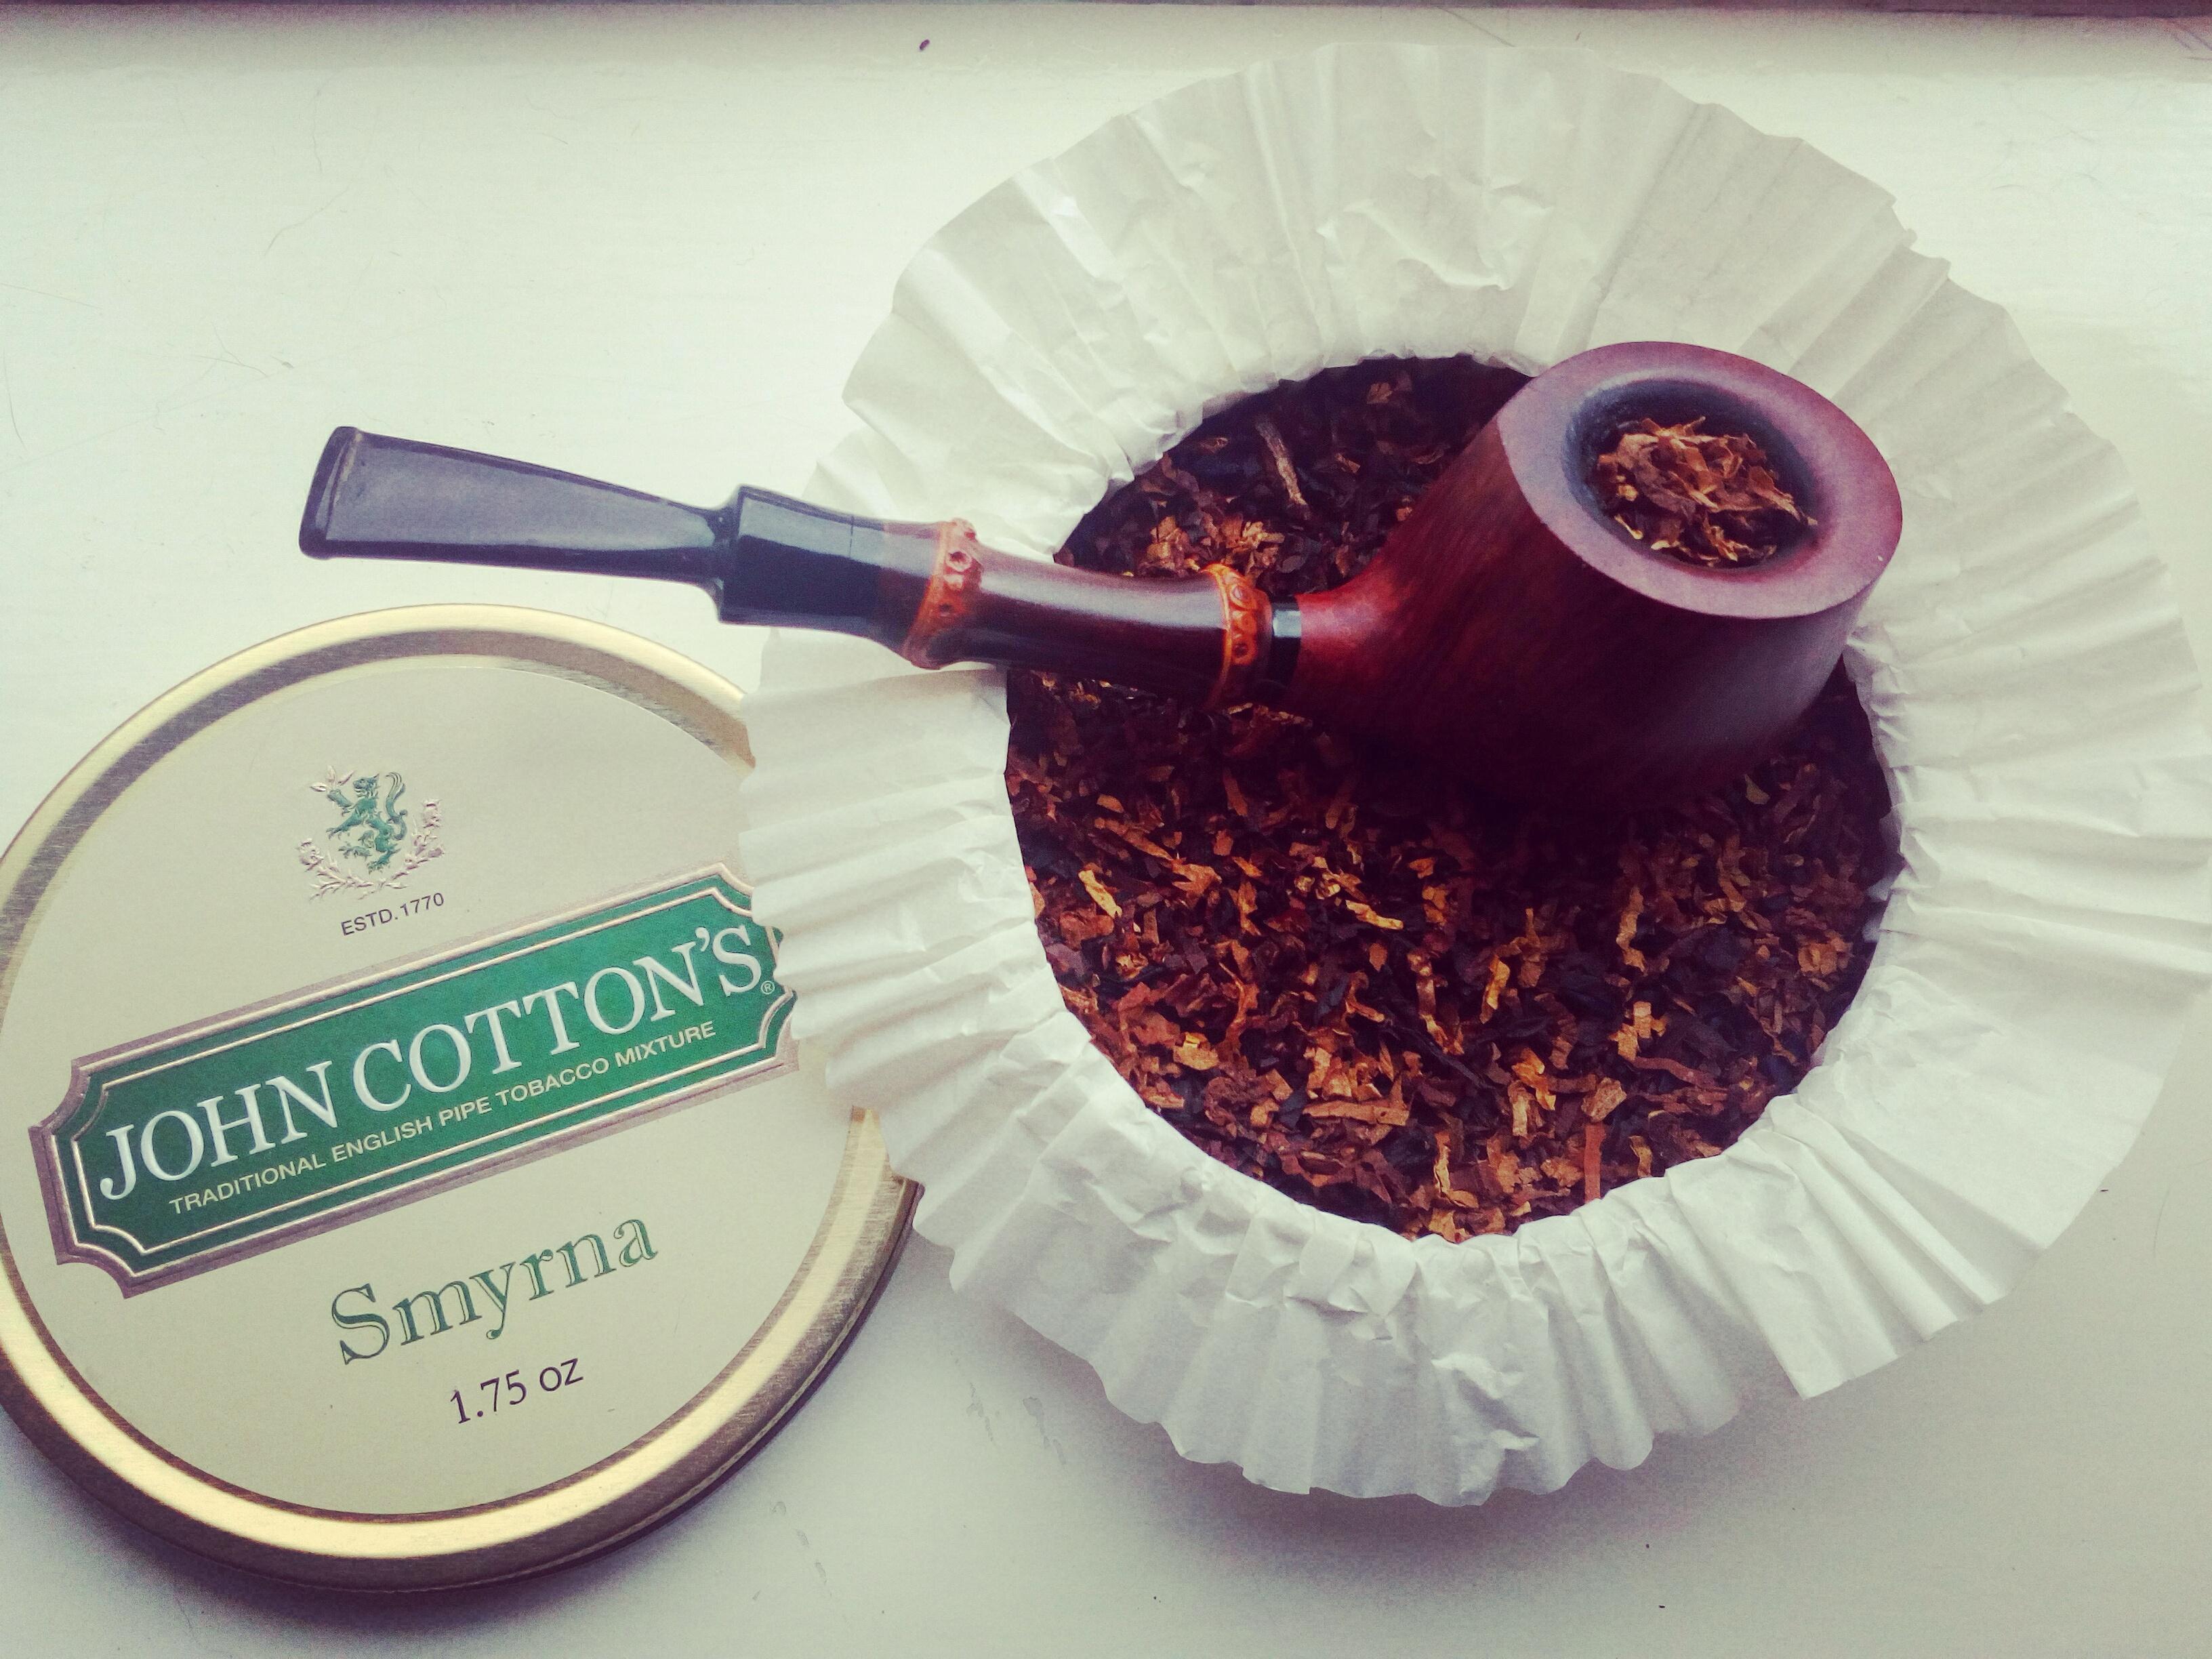 Miscellaneous & Smooth Smyrna a John Cotton story |